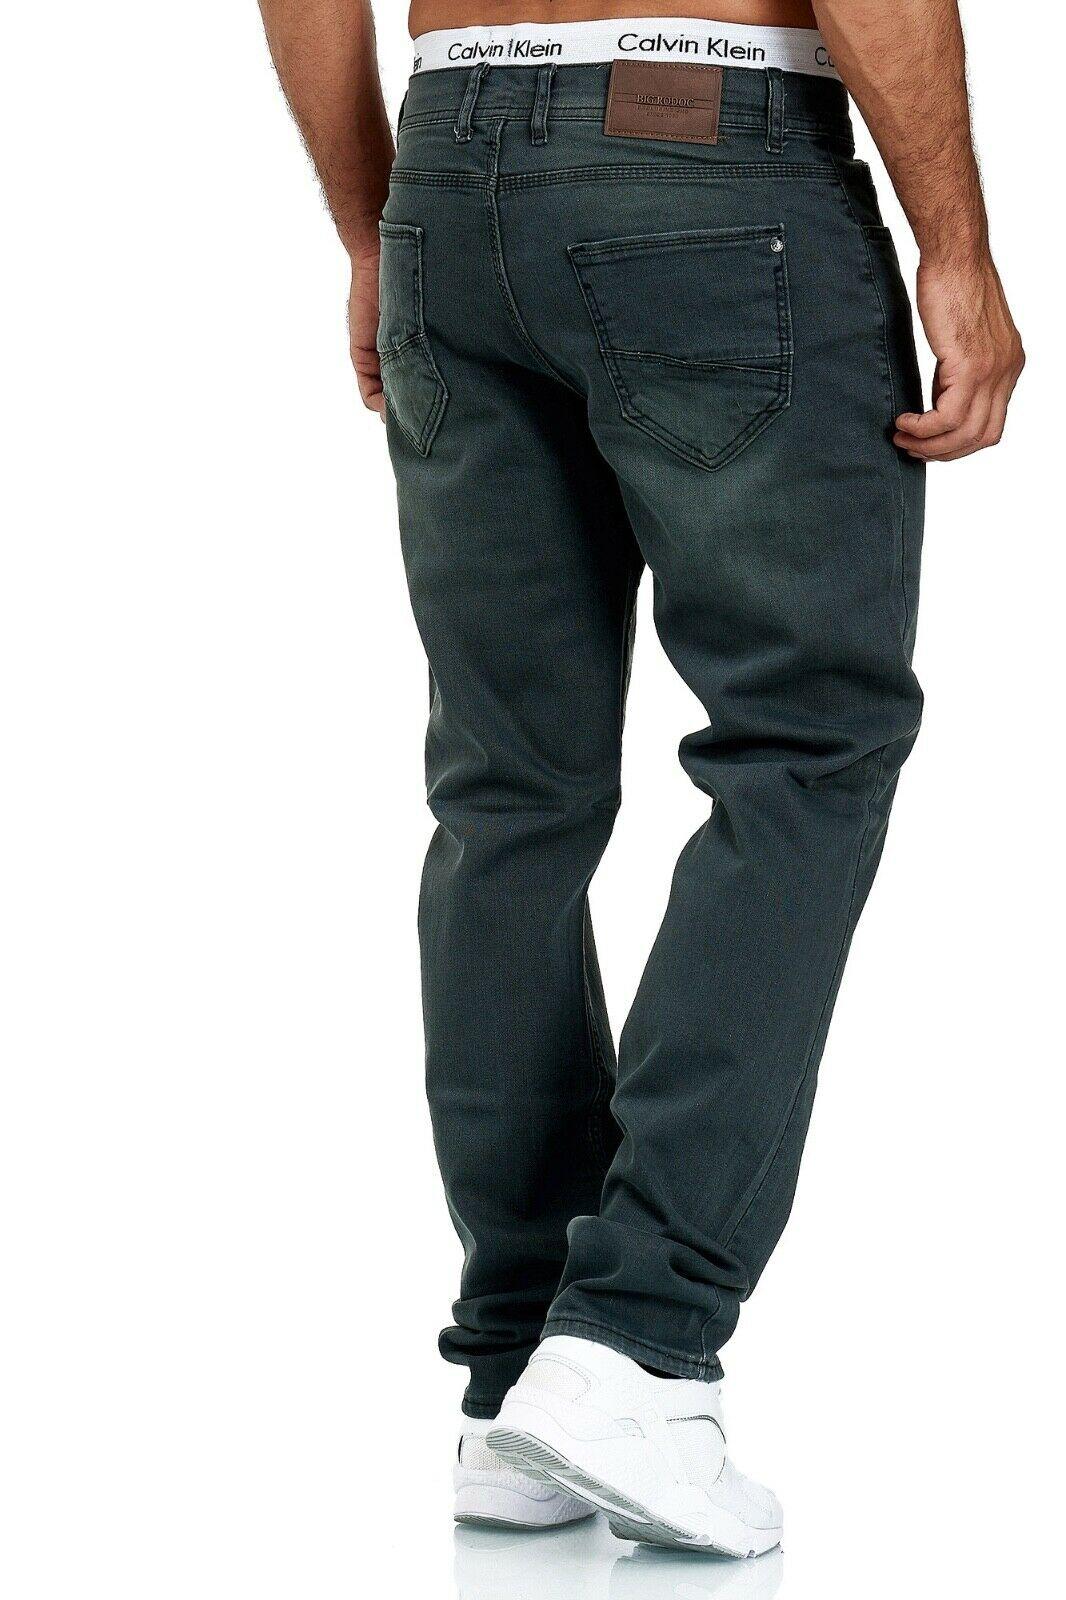 Herren-Jeans-Hose-Denim-KC-Black-Washed-Straight-Cut-Regular-Dicke-Naht-naehte Indexbild 49